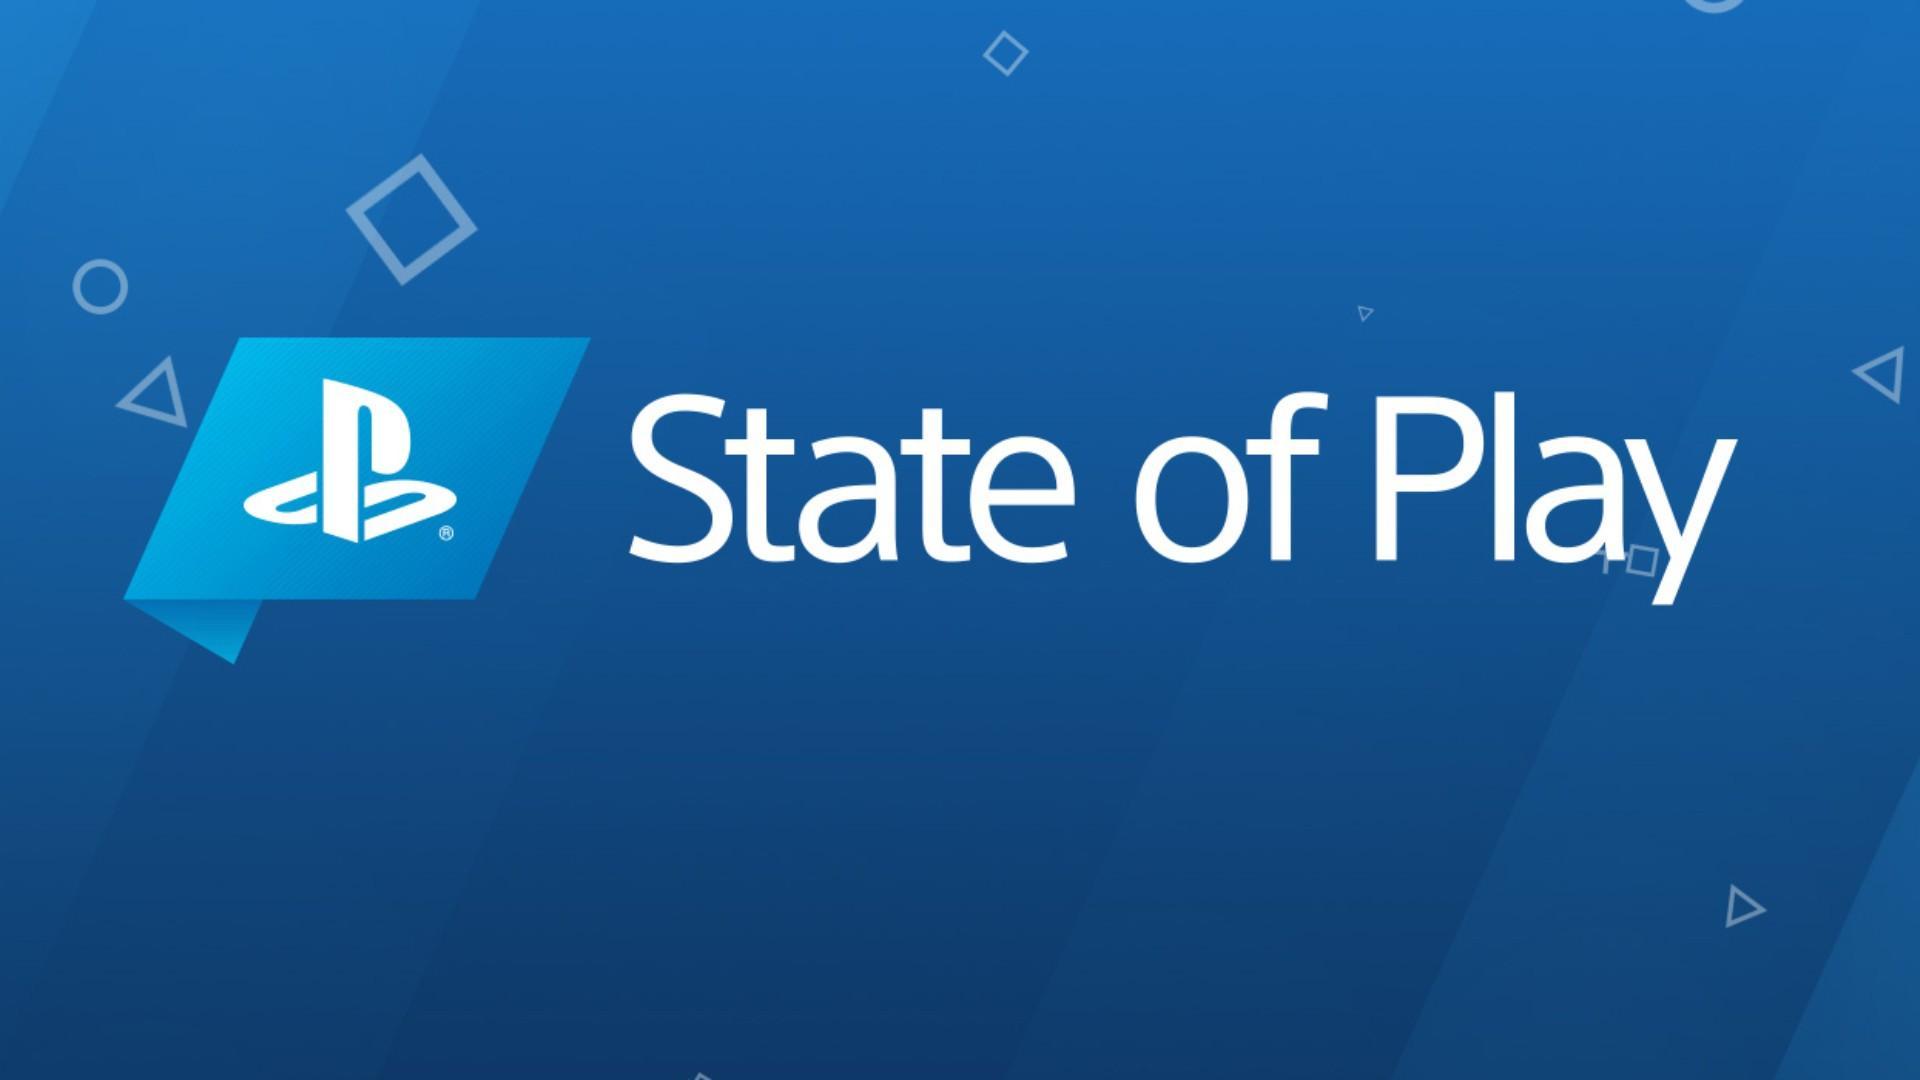 FFVII Remake, Kena: Bridge of Spirits, Returnal - всё, что показали на State of Play 2